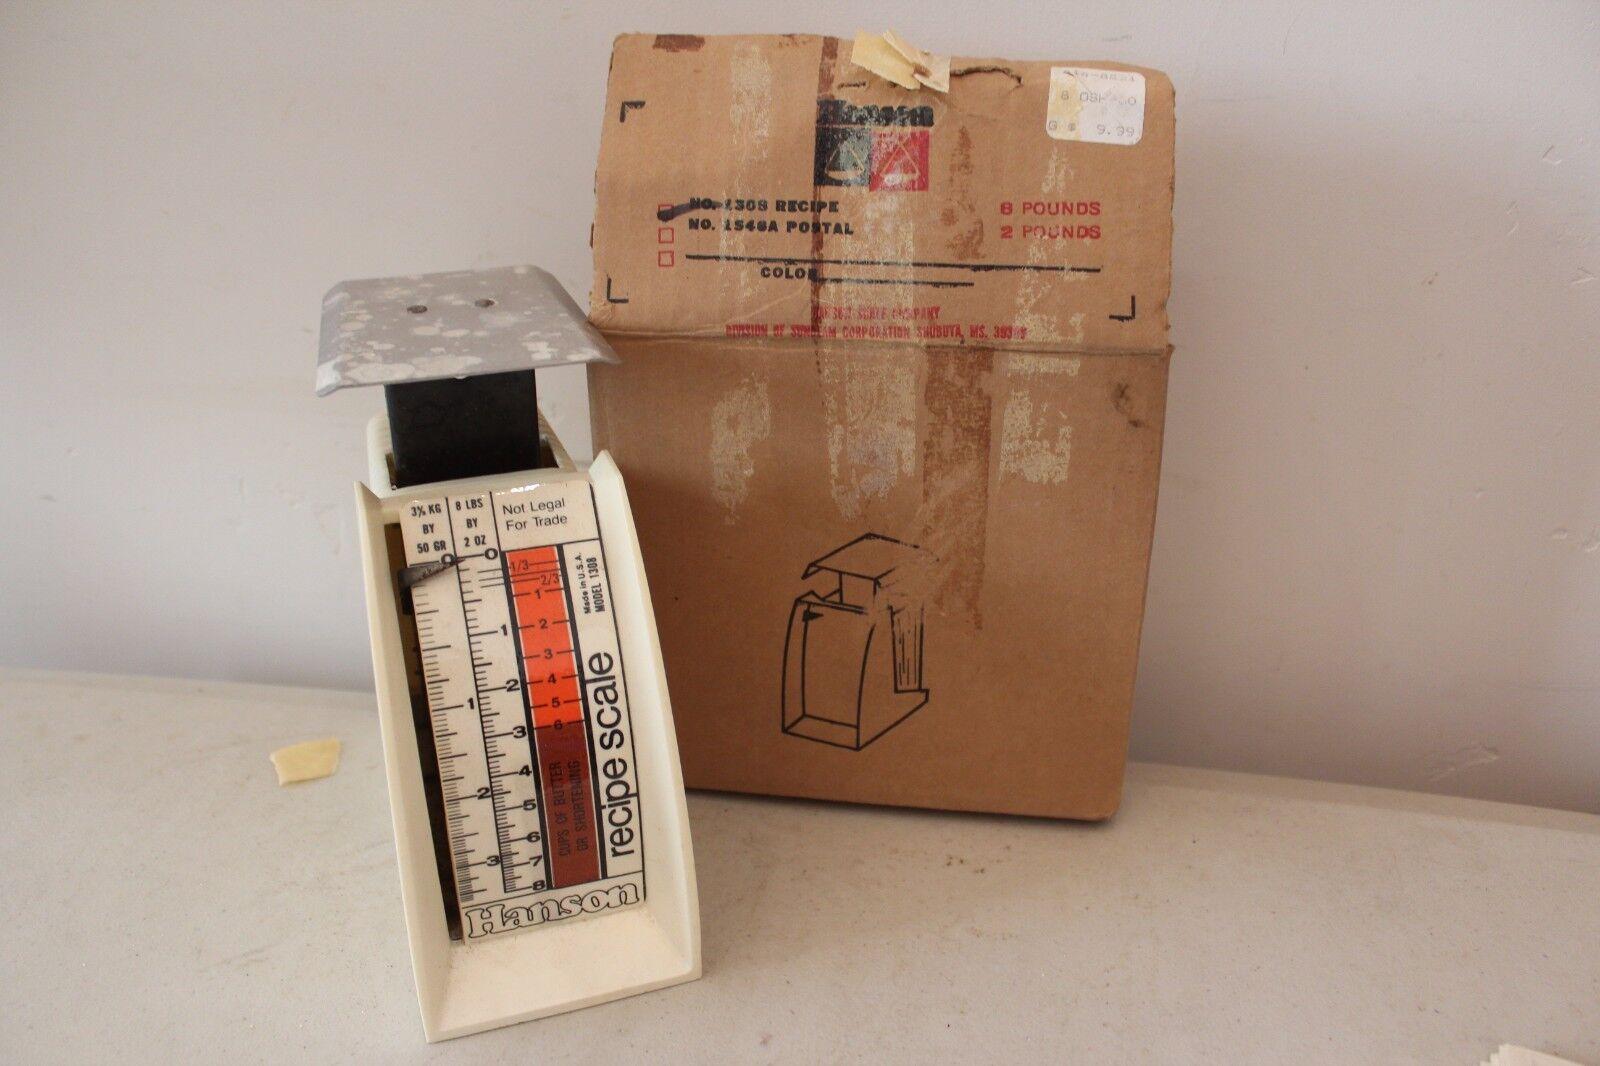 Vintage Hanson 8 lb Recipe Scale Model 1308 1986 L#1548